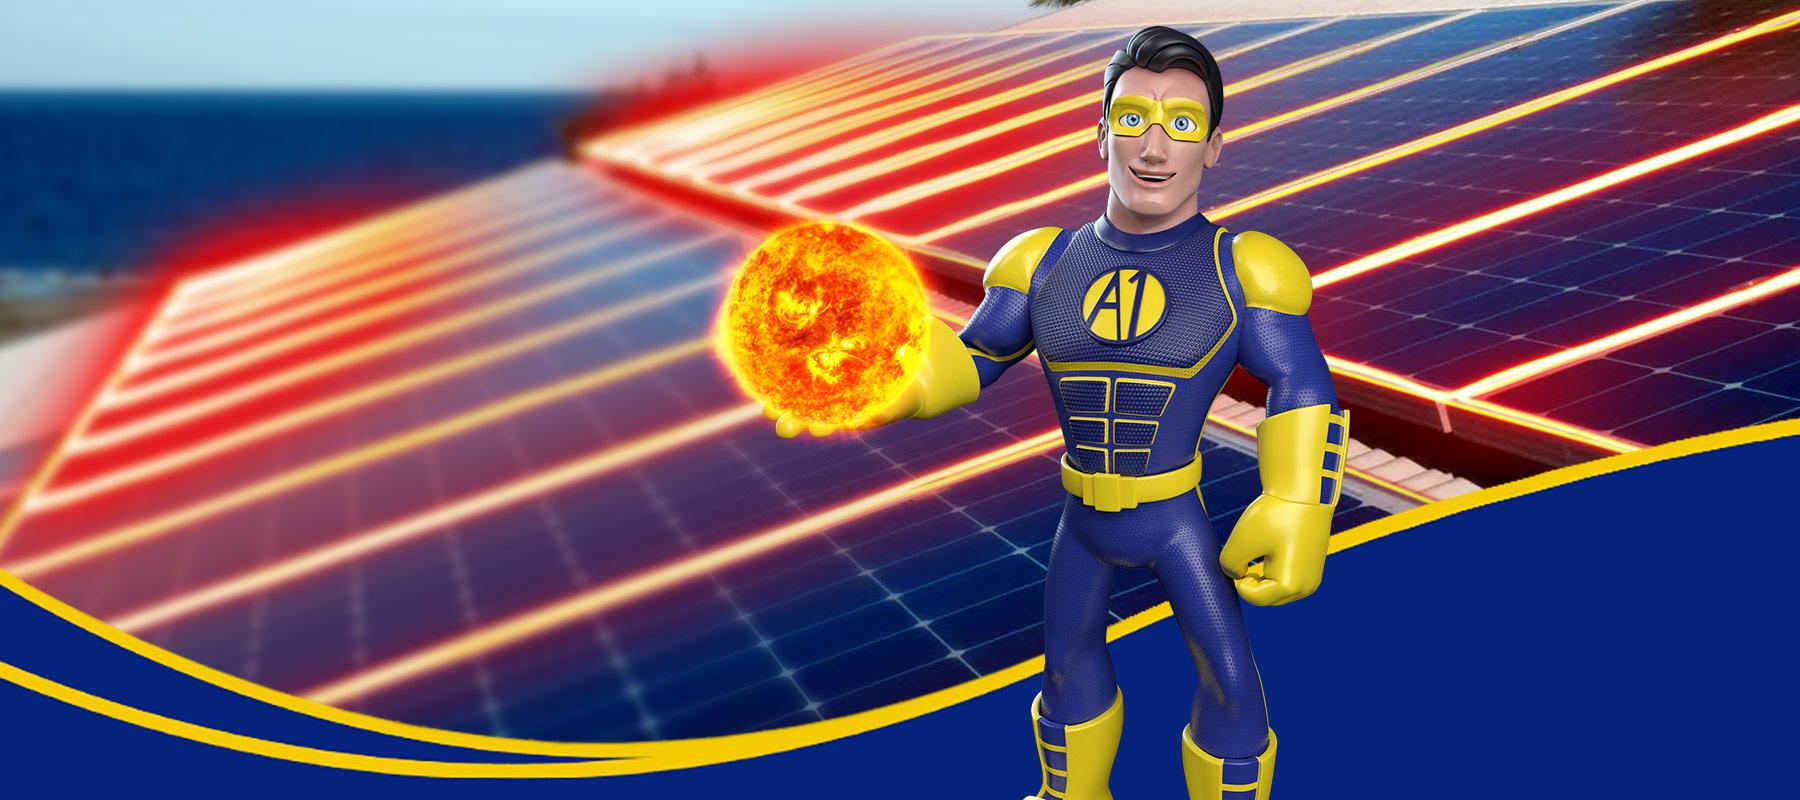 A1 BatteryPro Mascot